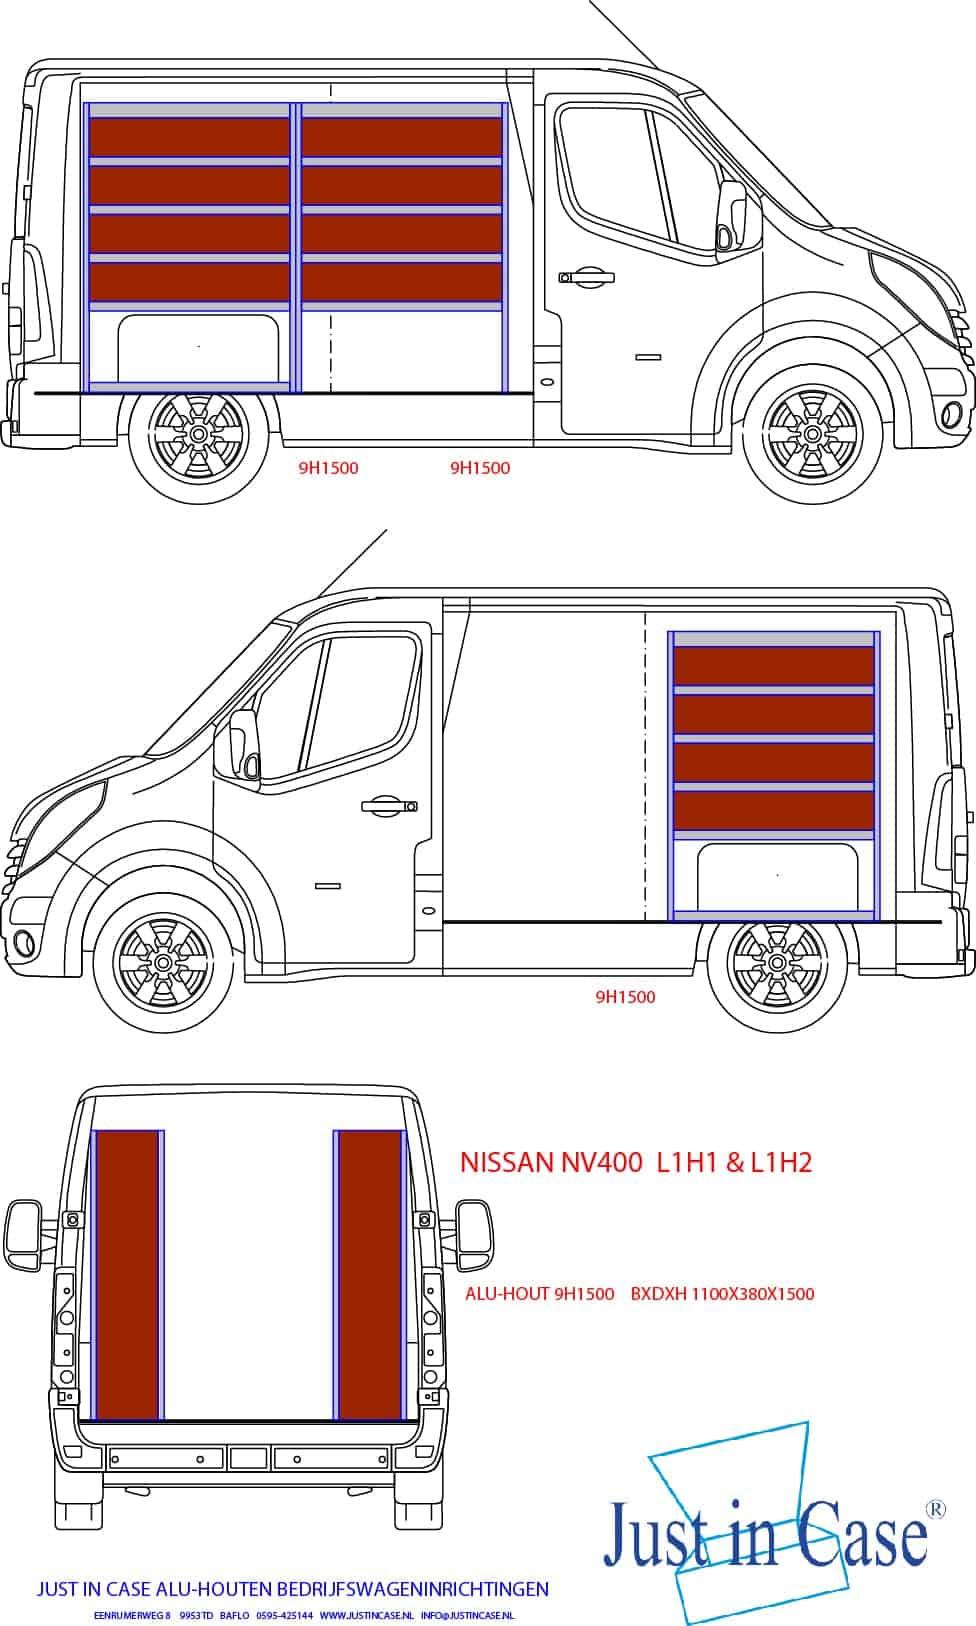 Nissan NV400 (L1) bedrijfswagen inrichten schets